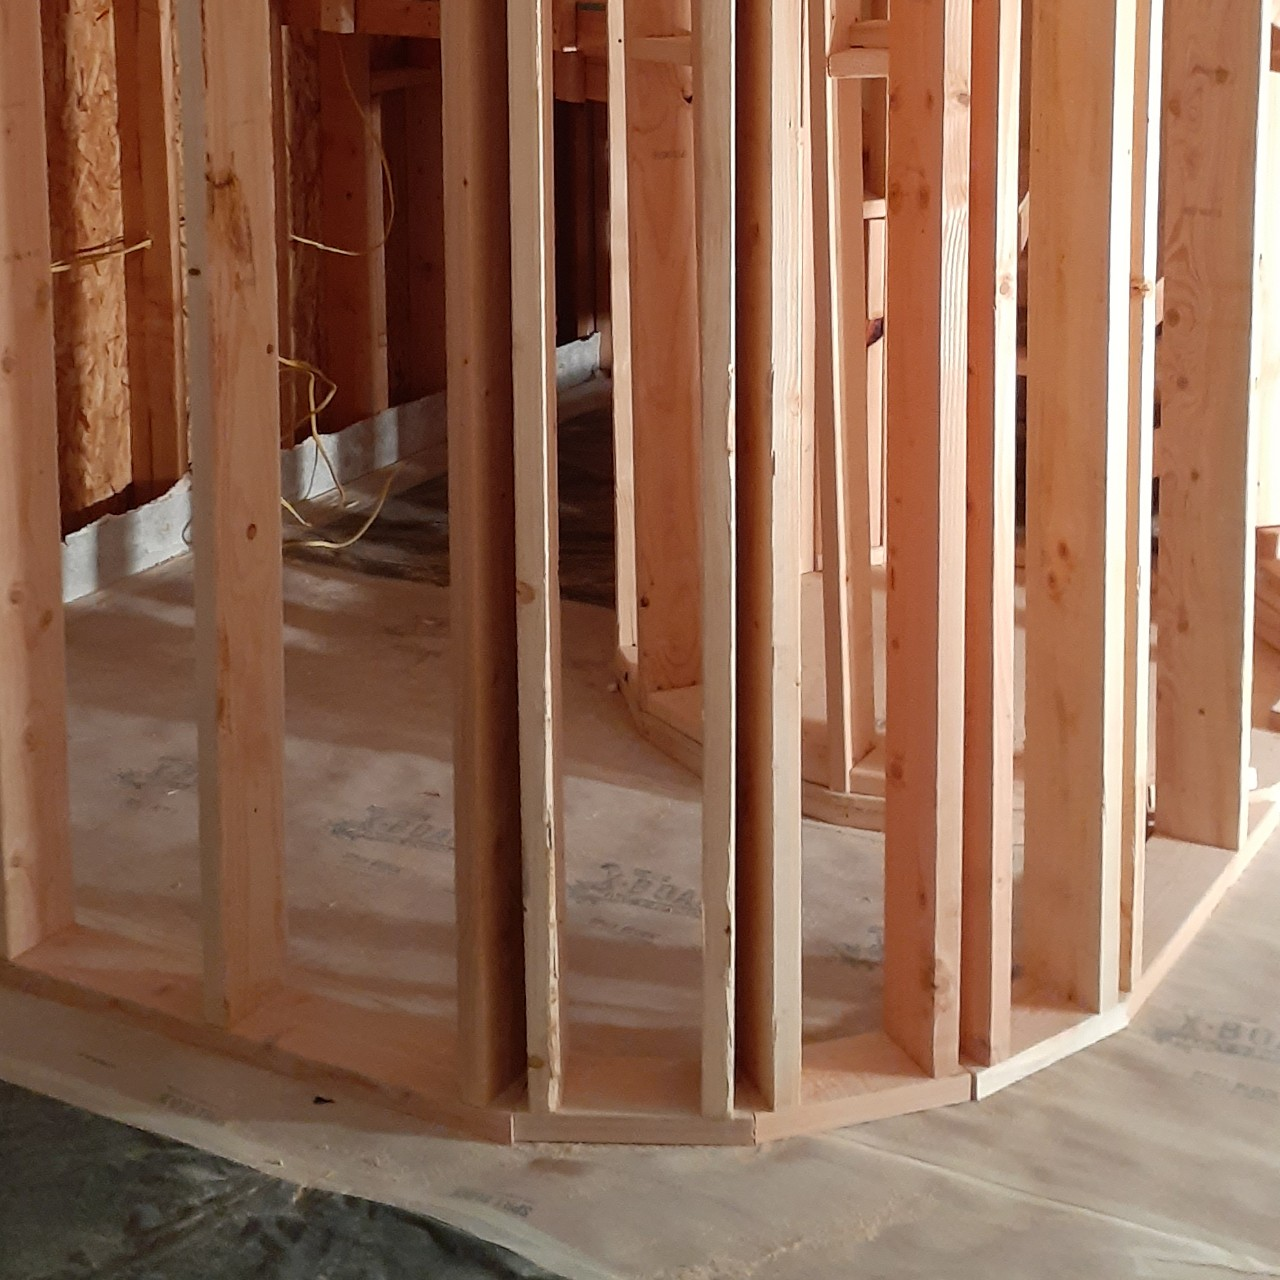 carpentry-wood-framing-second-floor-home-addition--framing-20